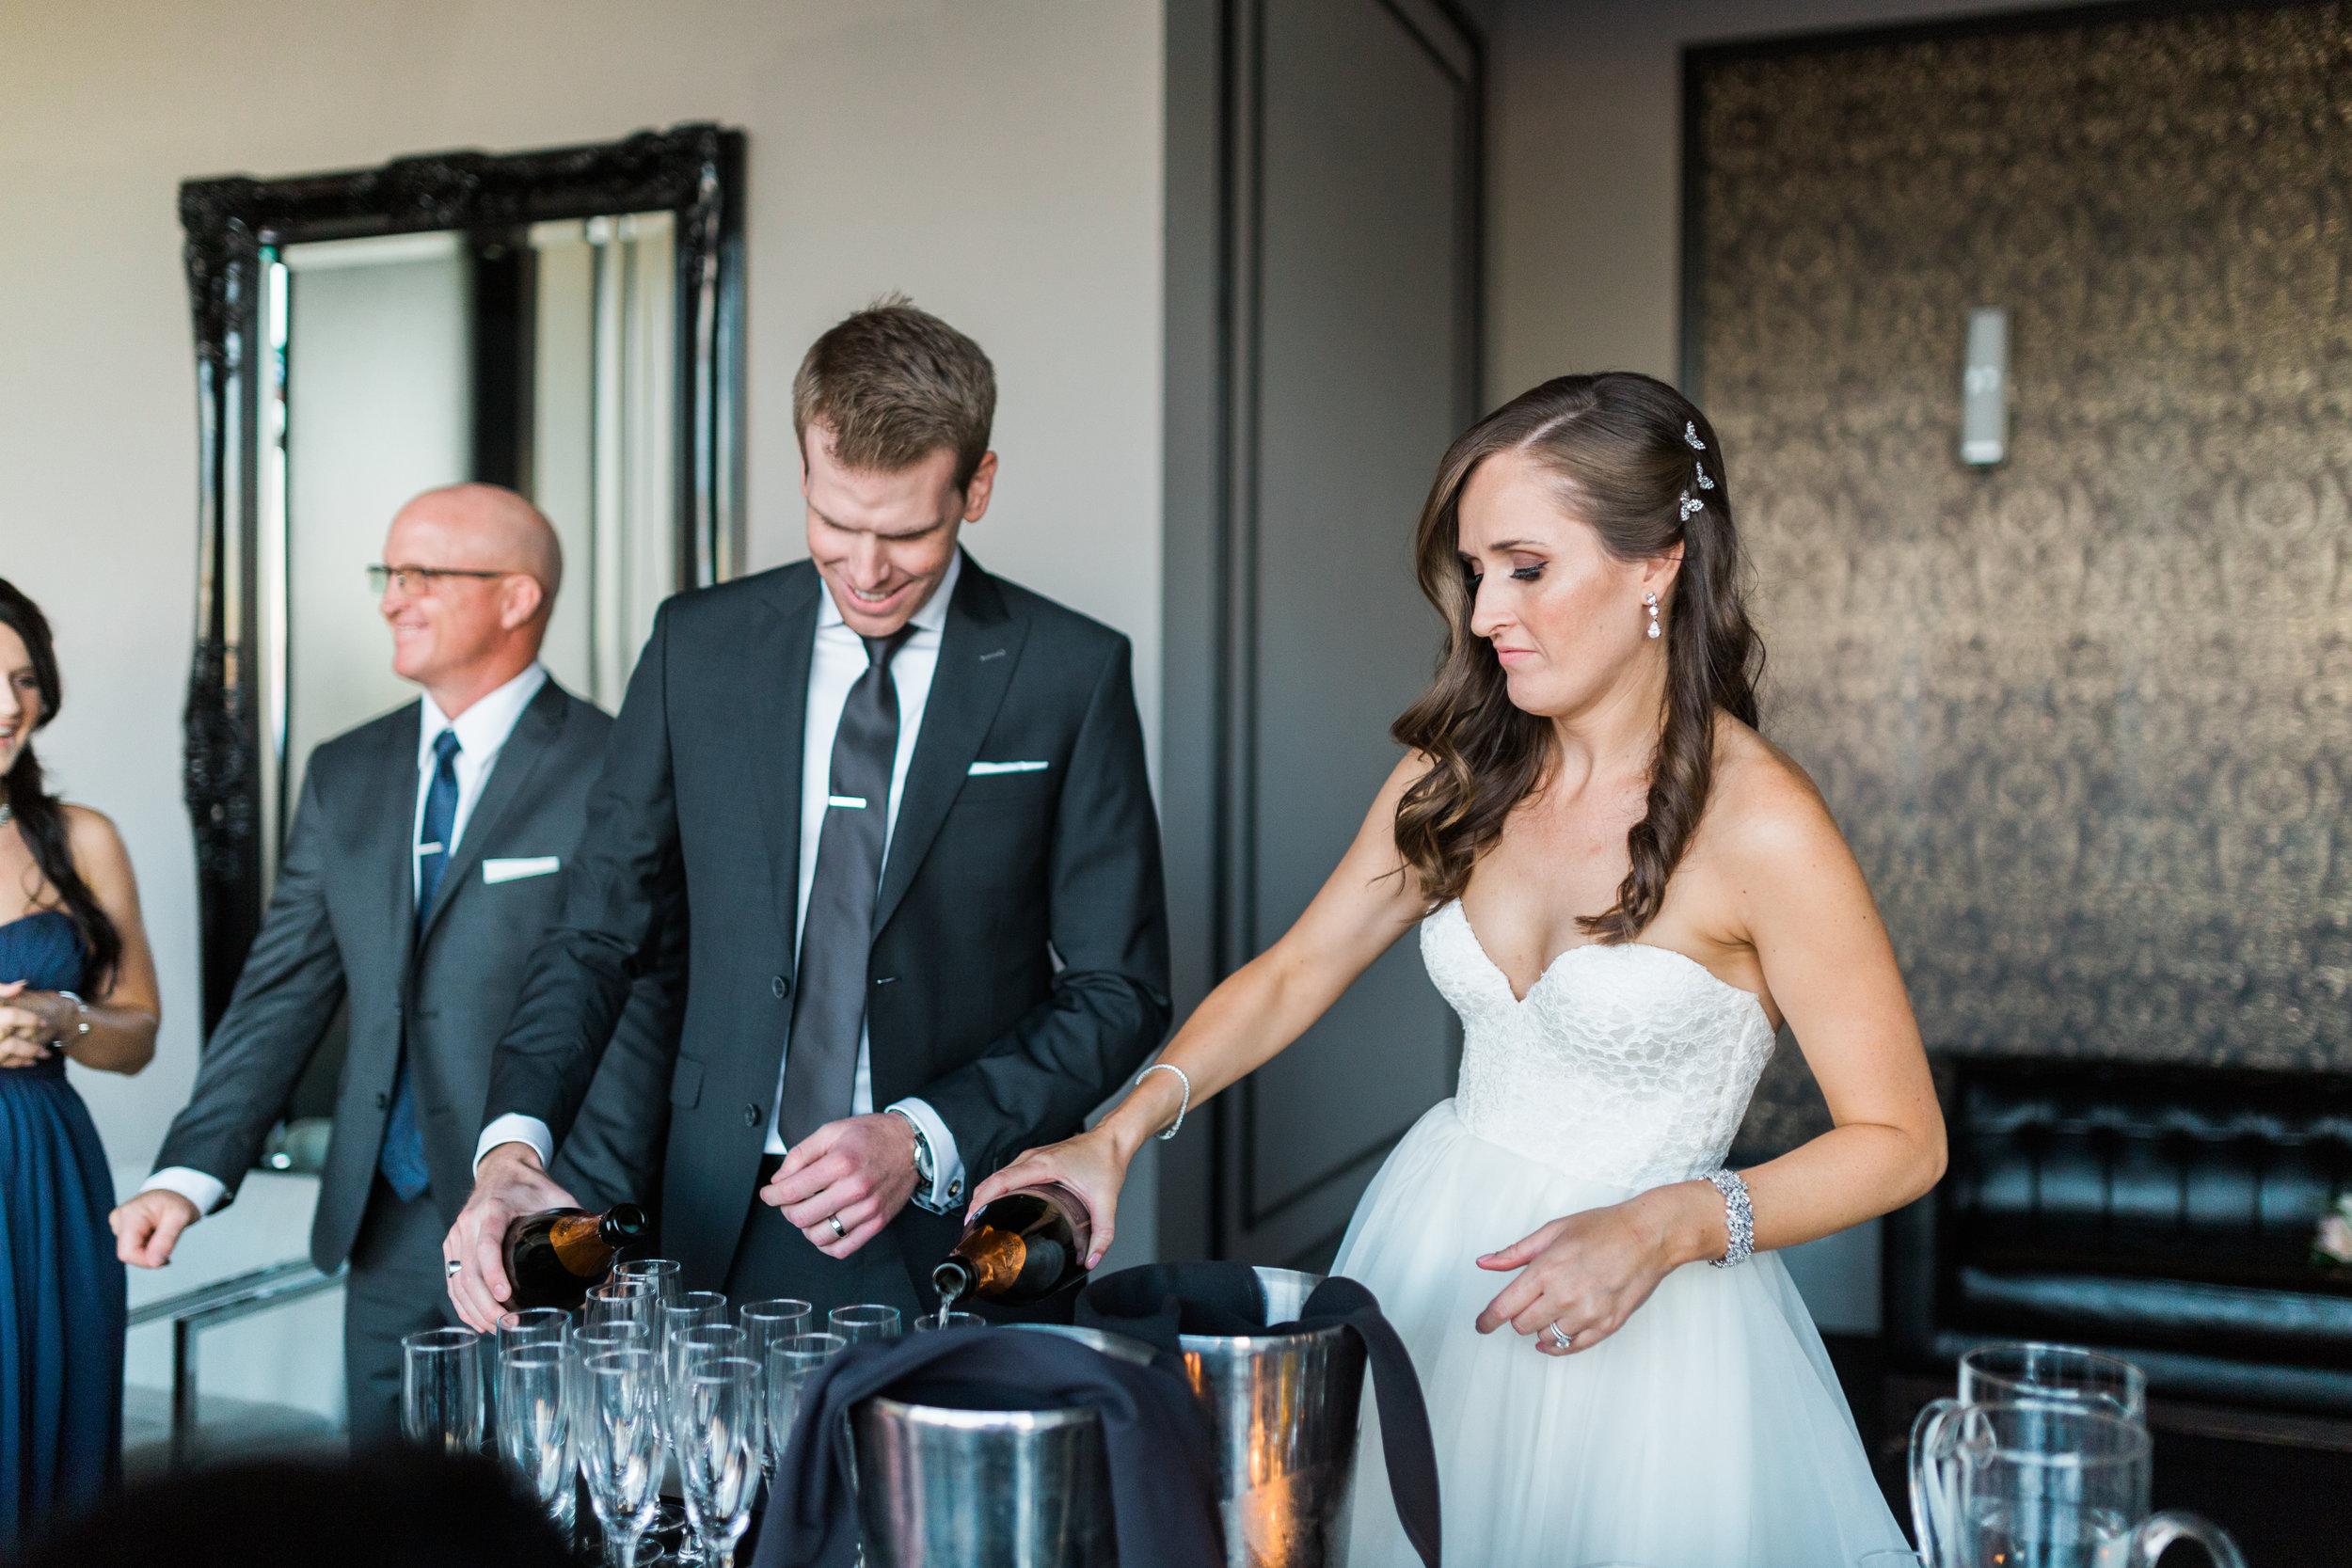 Toronto Fine Art Photographer - 180 Restaurant Wedding - Ceremony-5.jpg